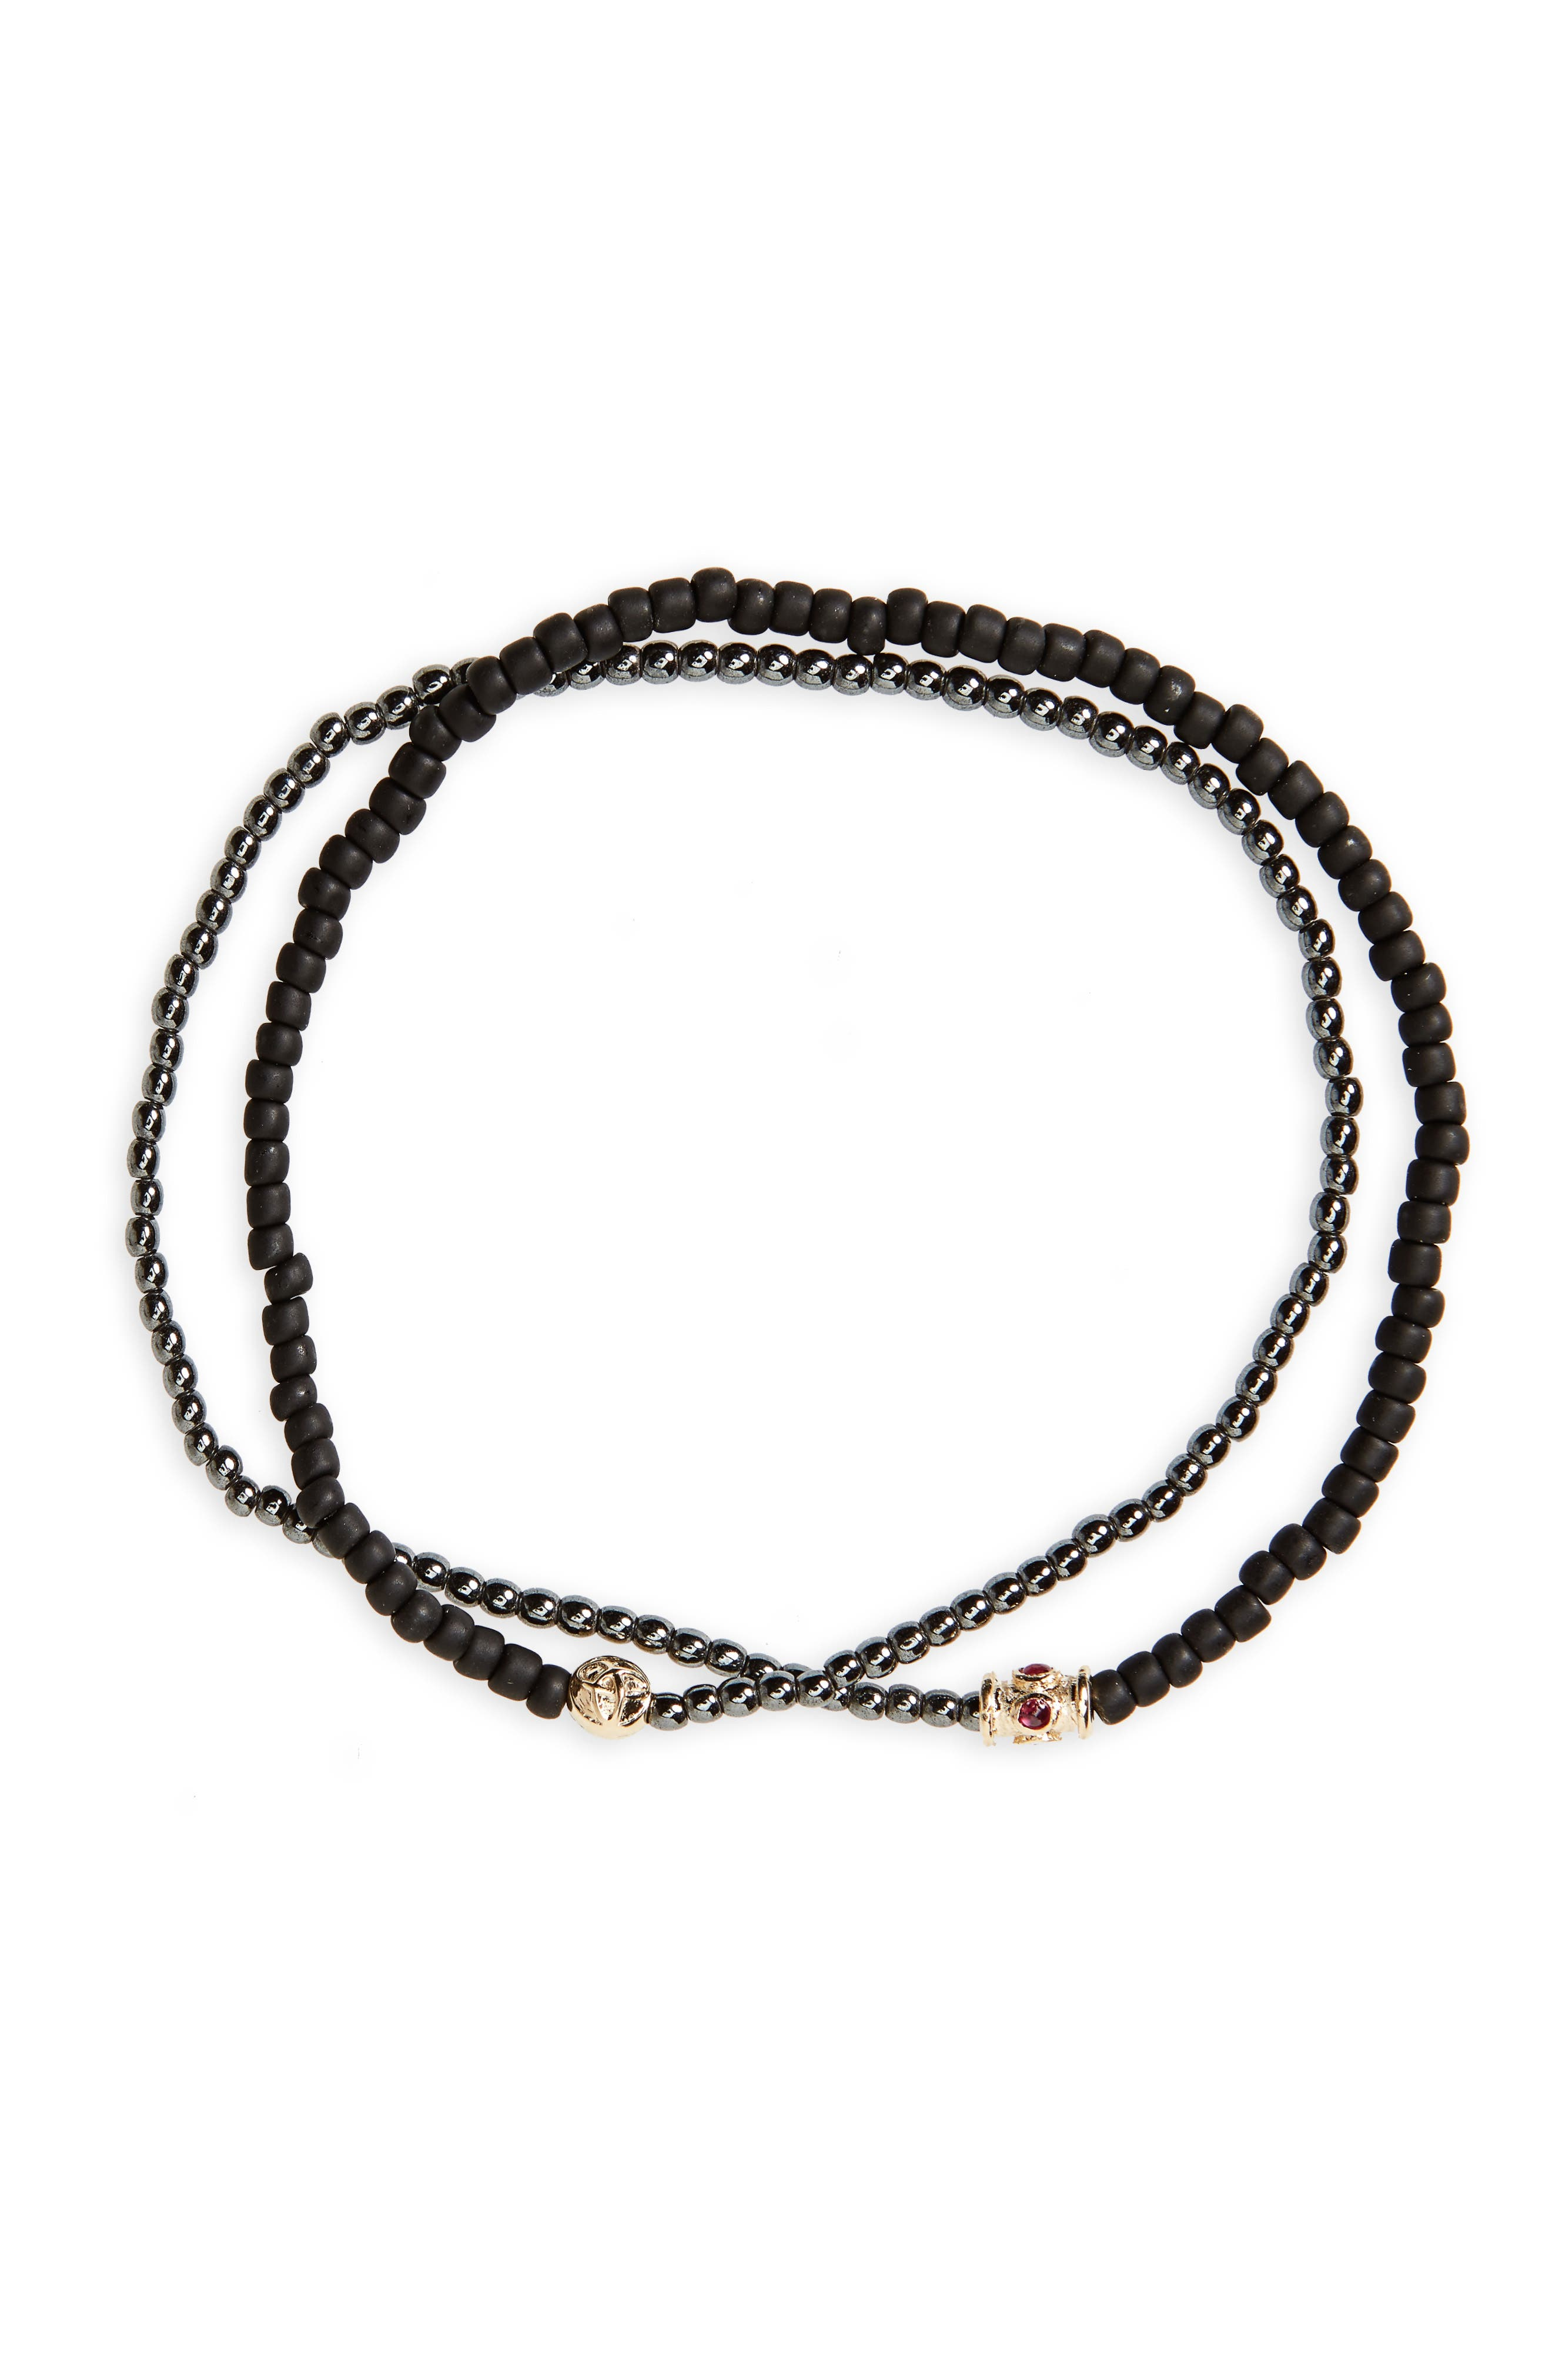 Ruby Barrel Bead Wrap Bracelet,                             Main thumbnail 1, color,                             011